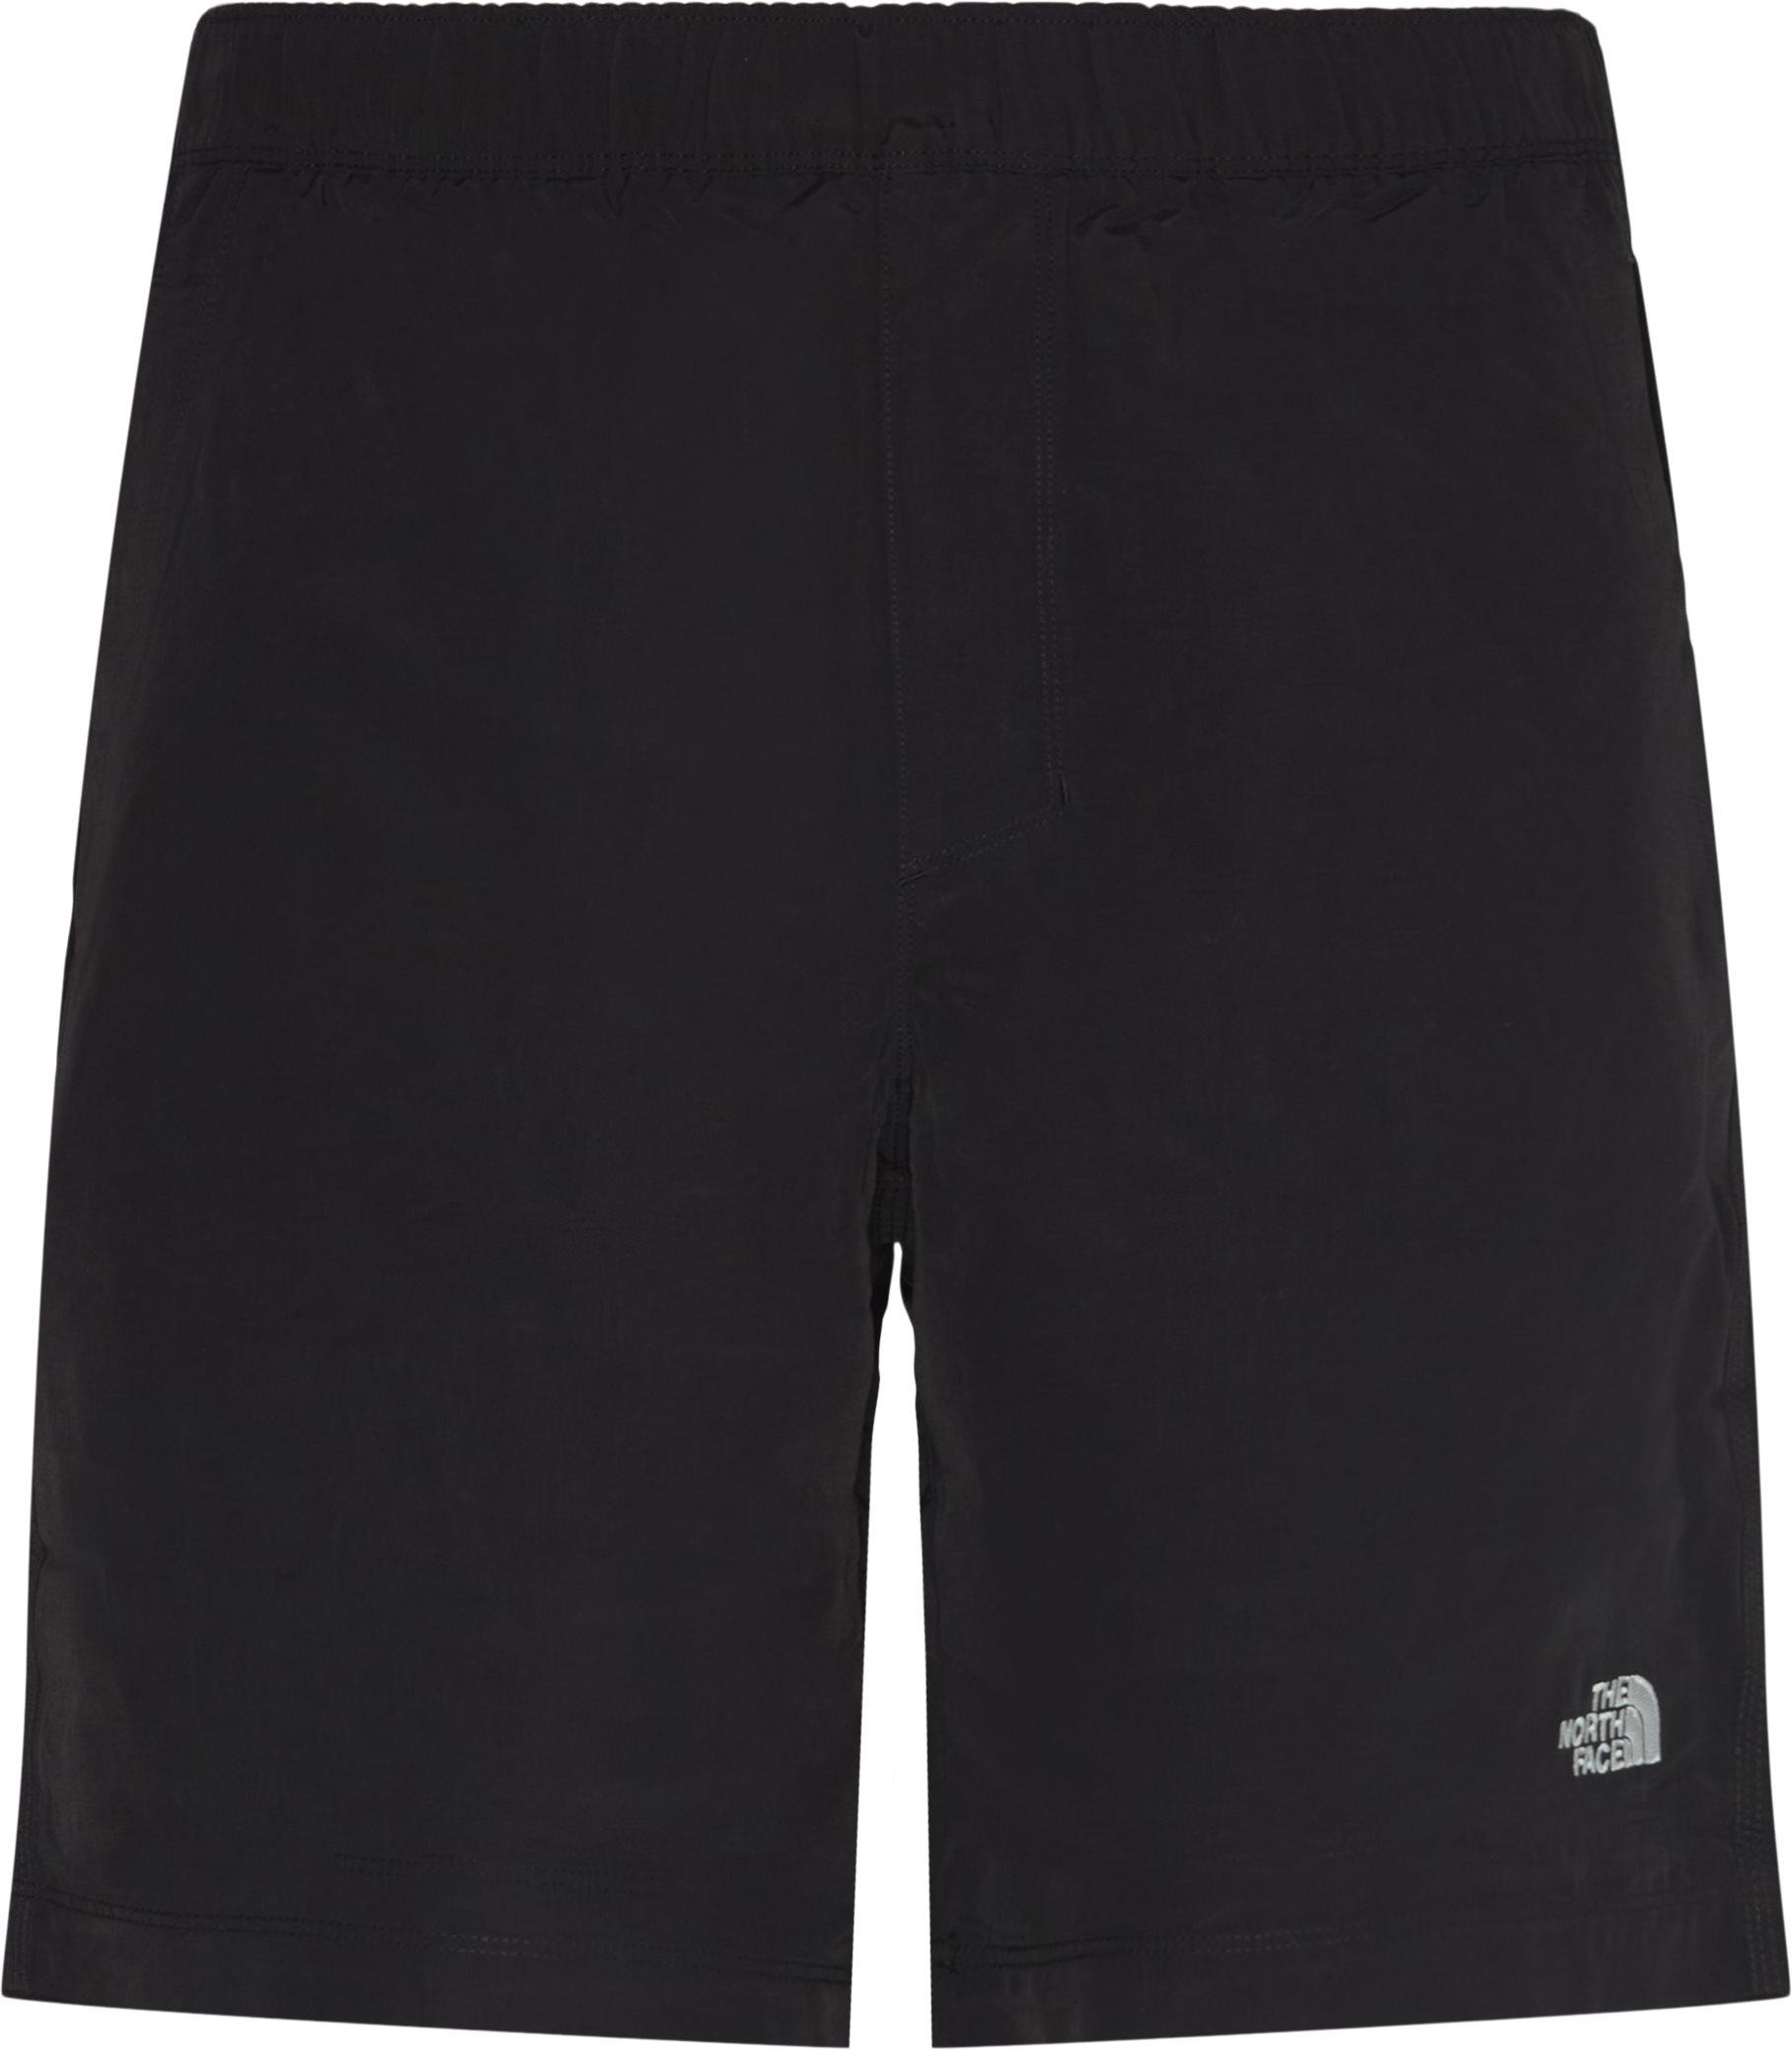 Class V Water shorts - Shorts - Regular fit - Sort